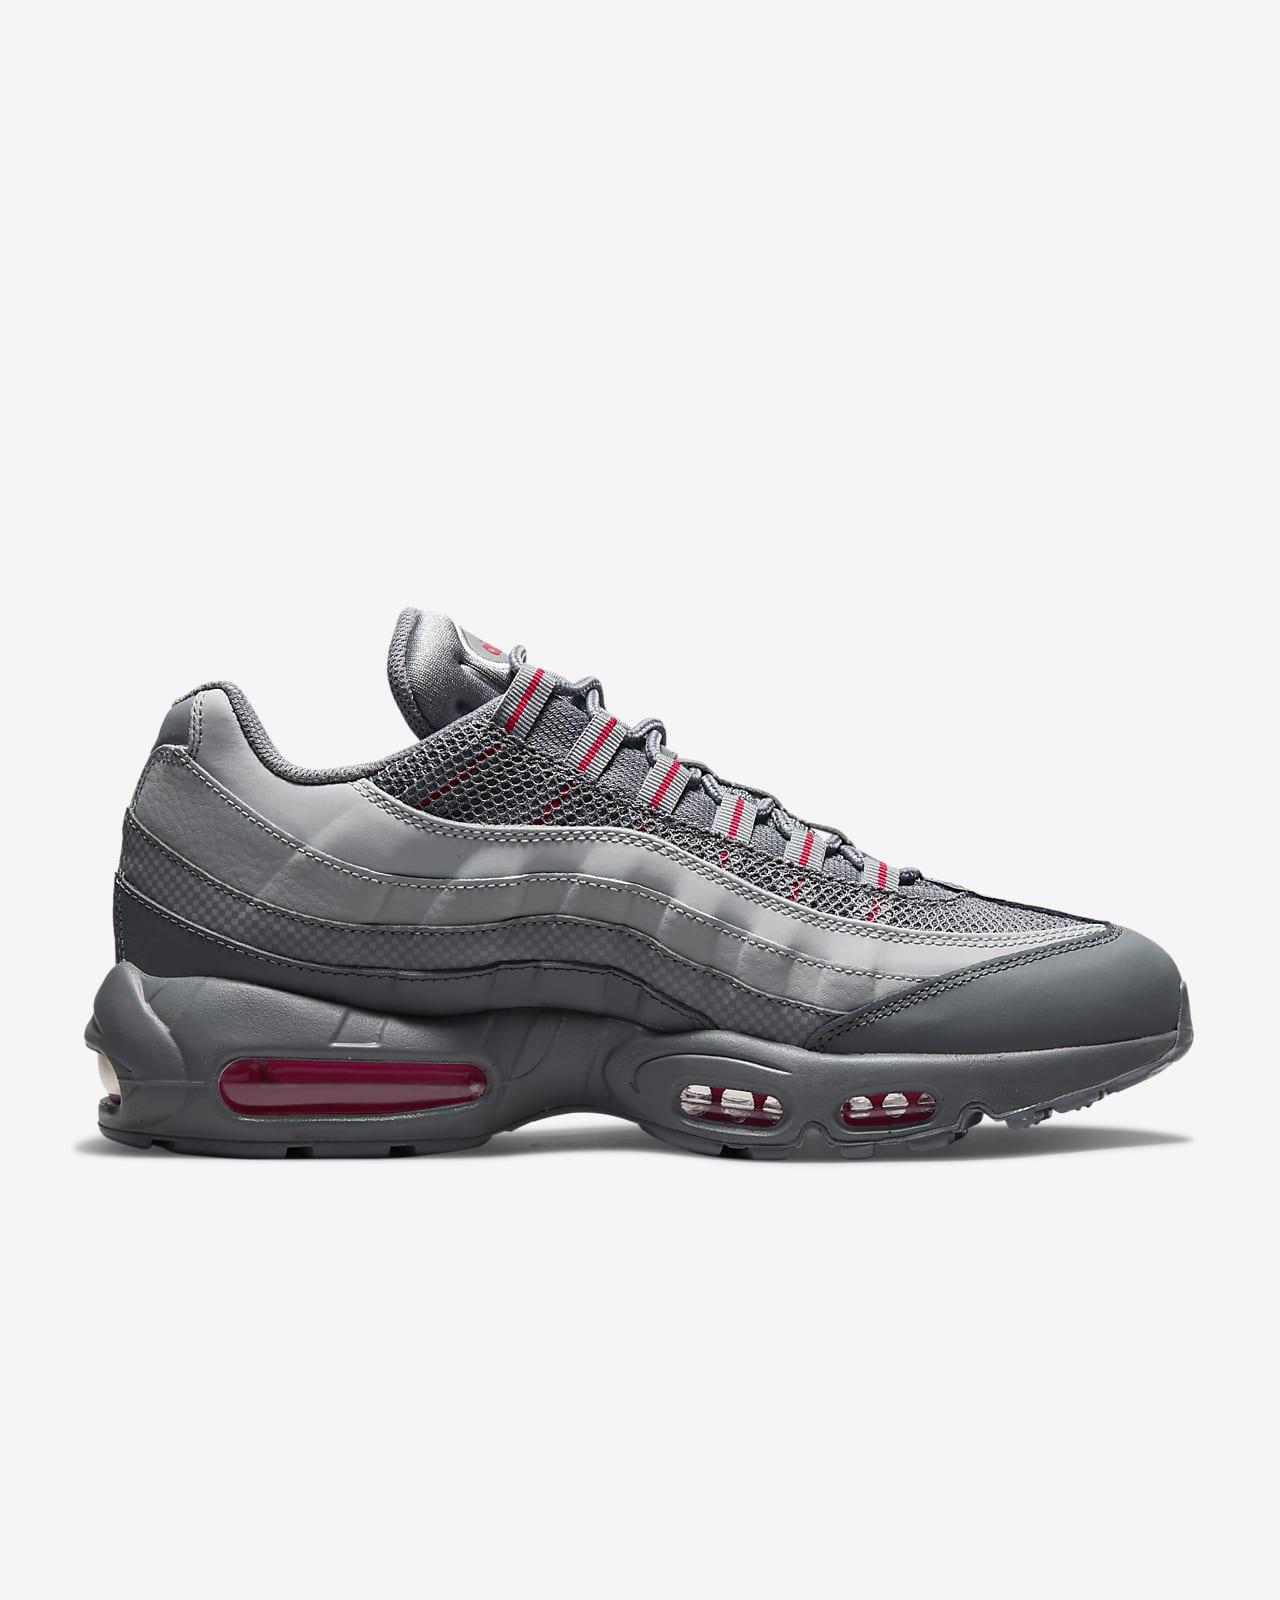 Chaussures Nike Air Max 95 Essential pour Homme. Nike LU